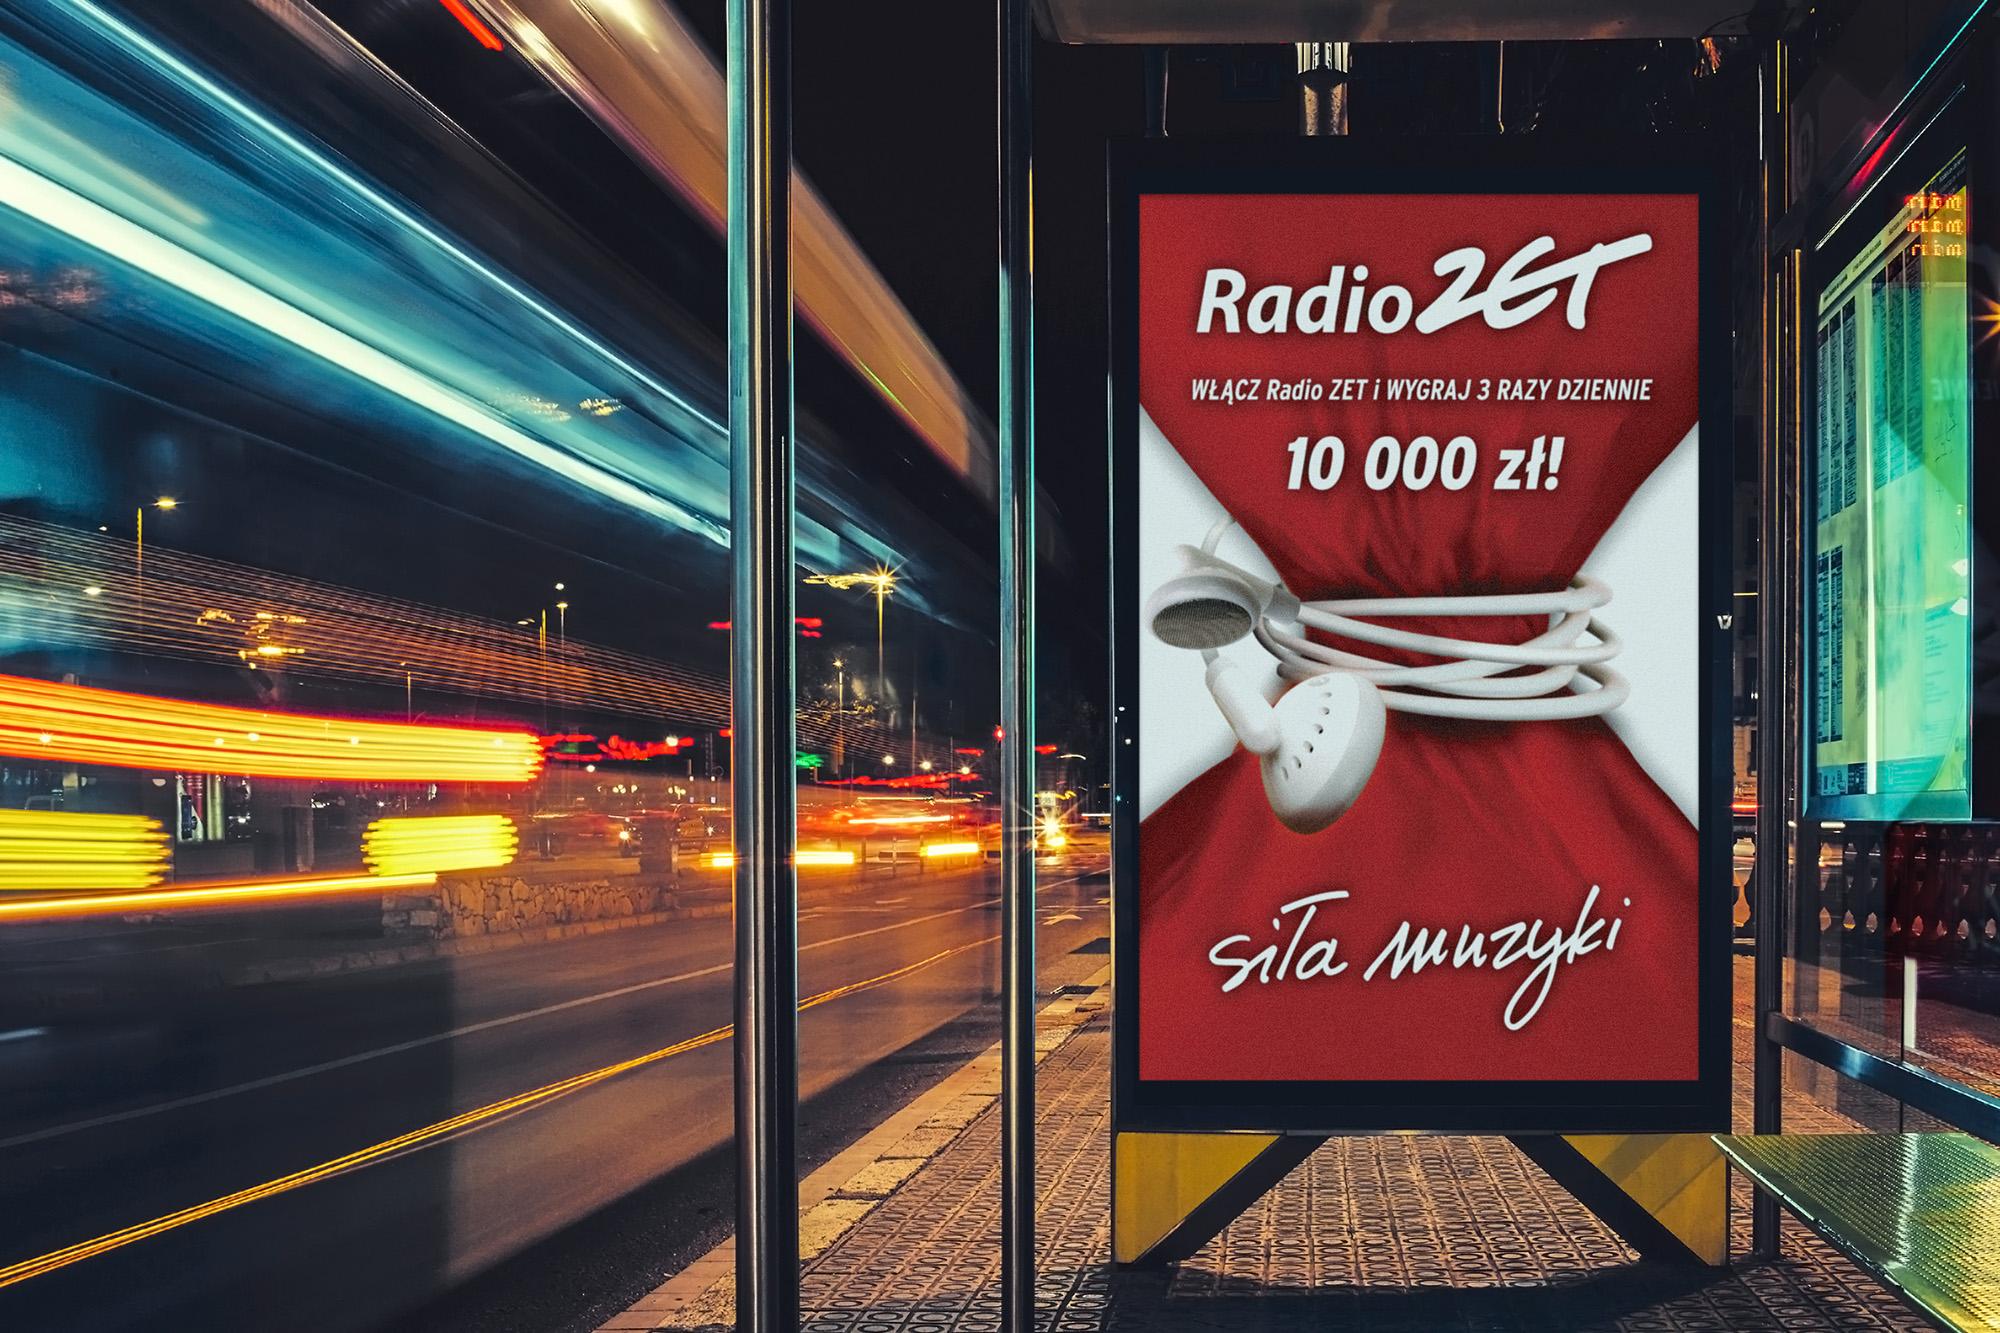 outdoor, plakat citylight billboard kampania wizerunkowa, projekty graficzne, design newspaper, ilustracja, concept art, key visual, art designer Ireneusz Bloch, one-2-one